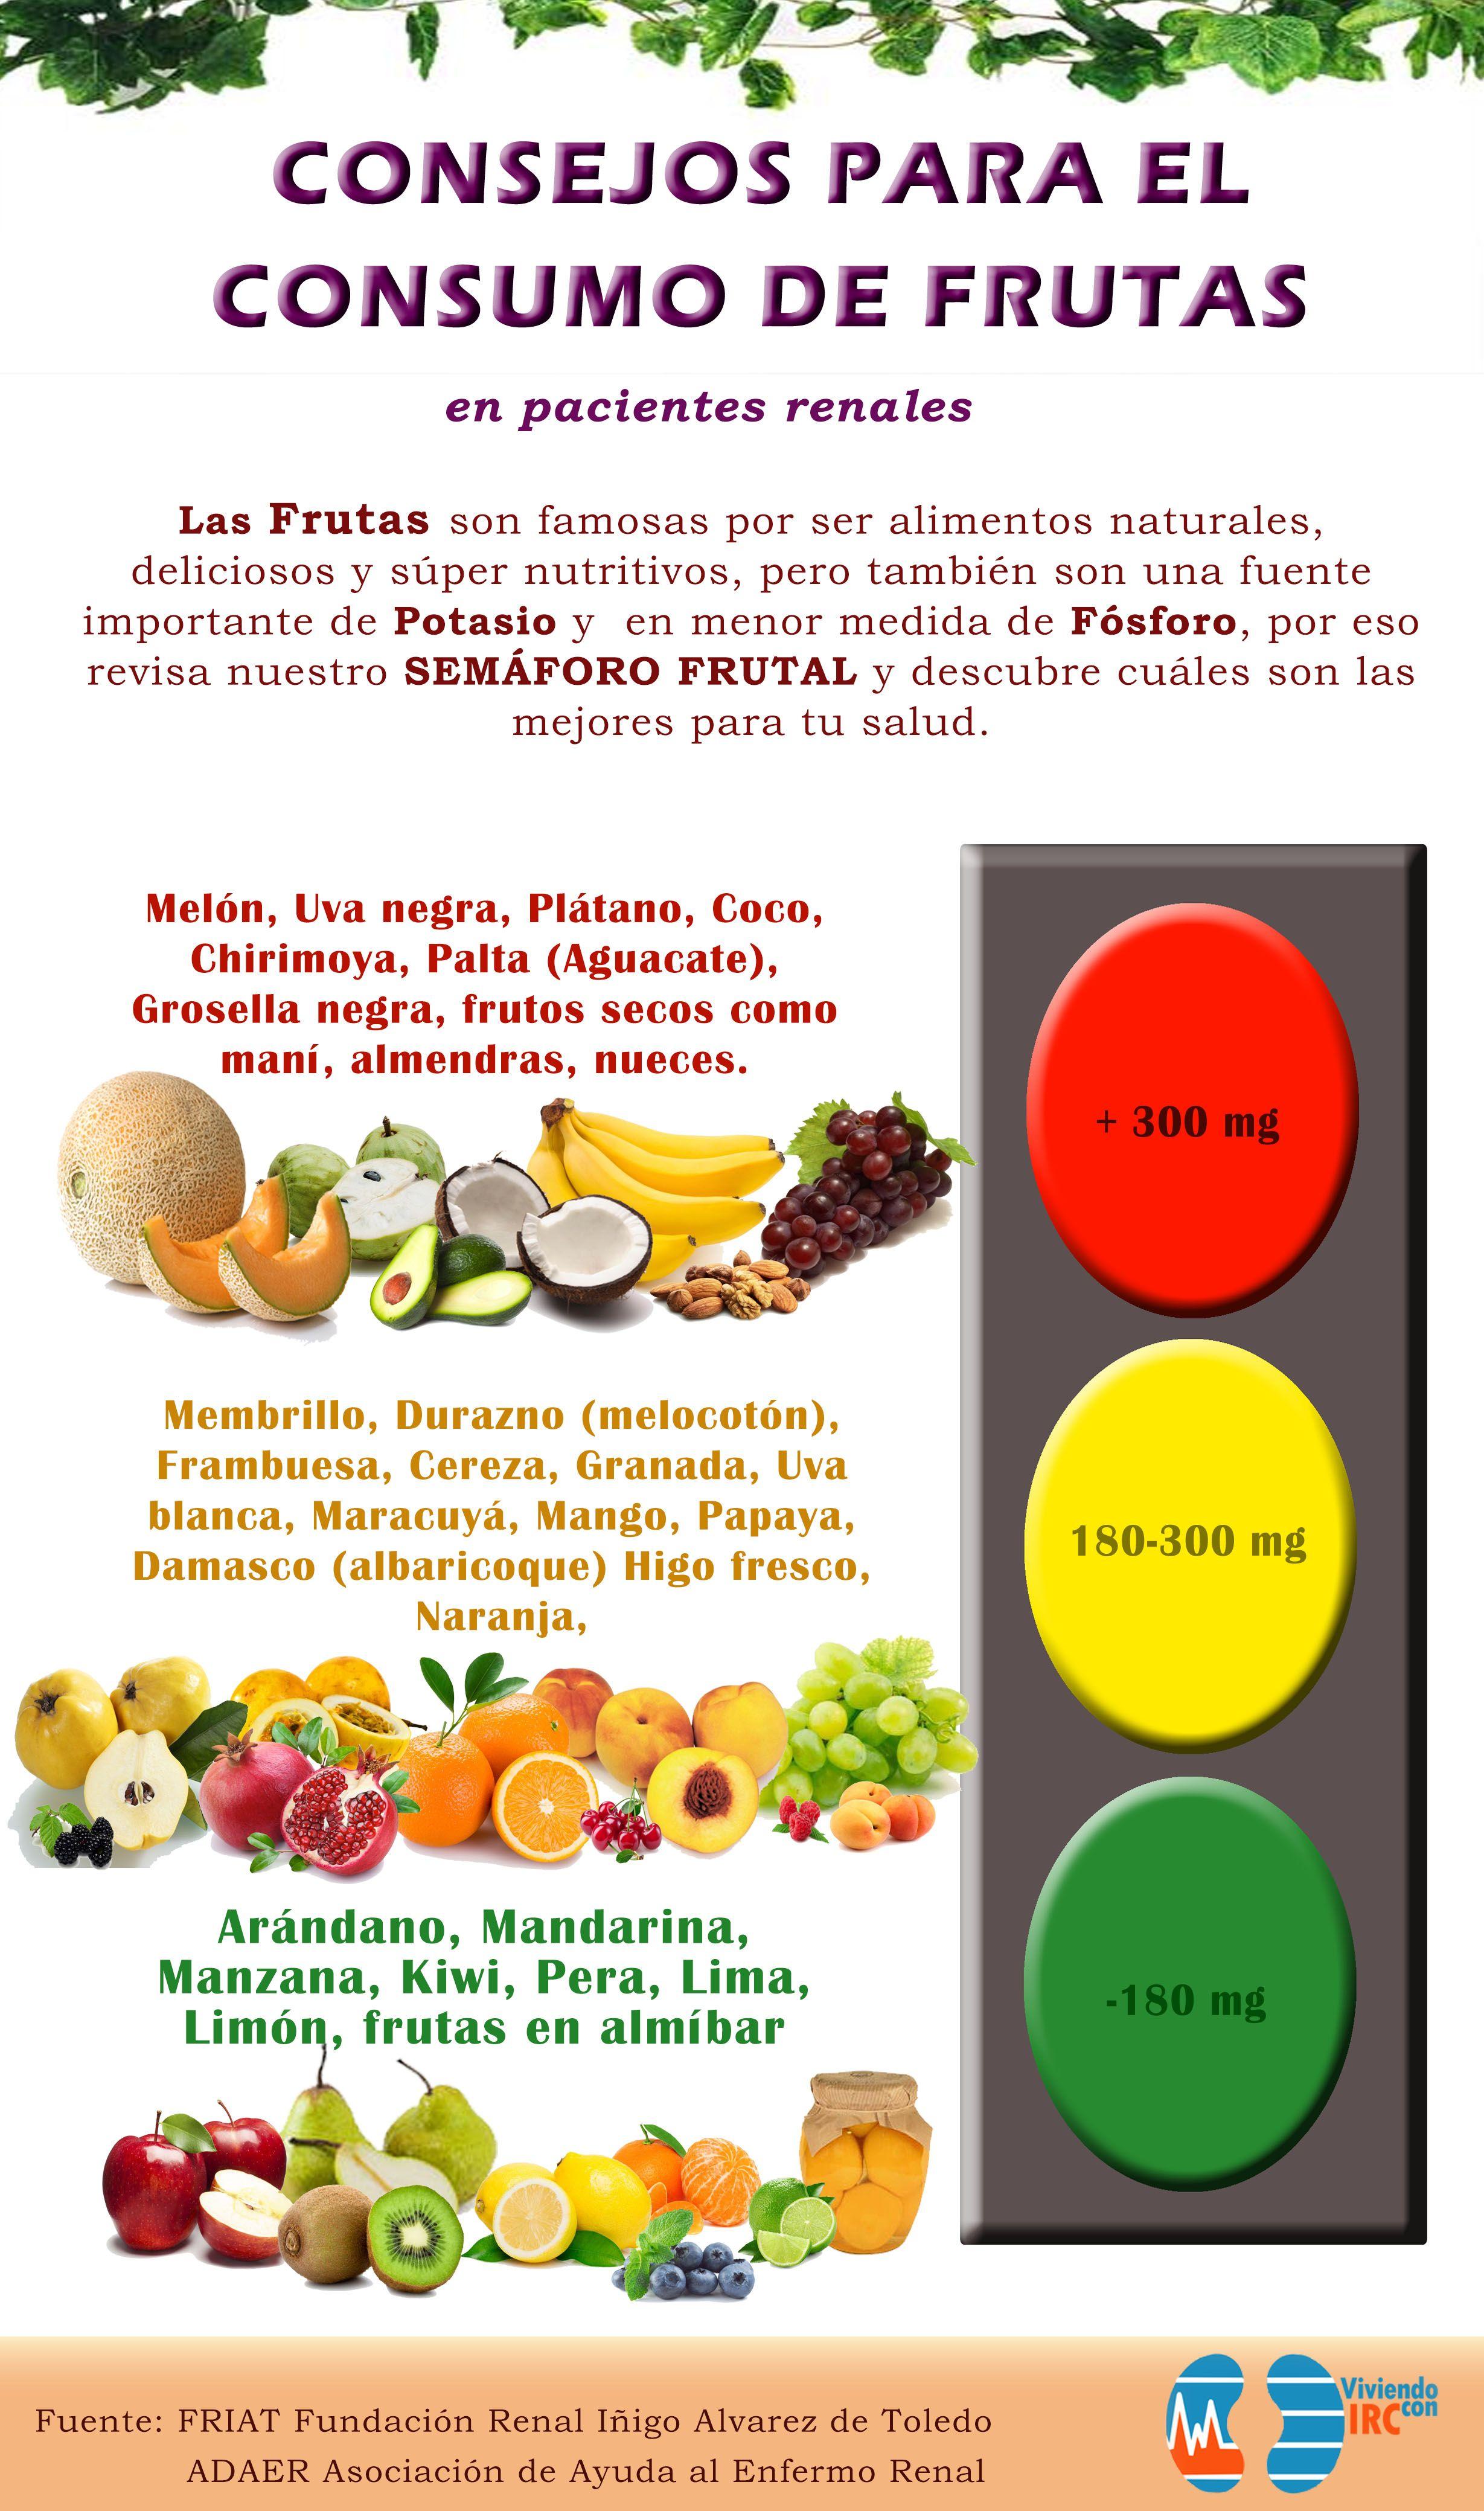 F sforo potasio dieta renal salud renal irc erc ri ones for Alimentos prohibidos para insuficiencia renal